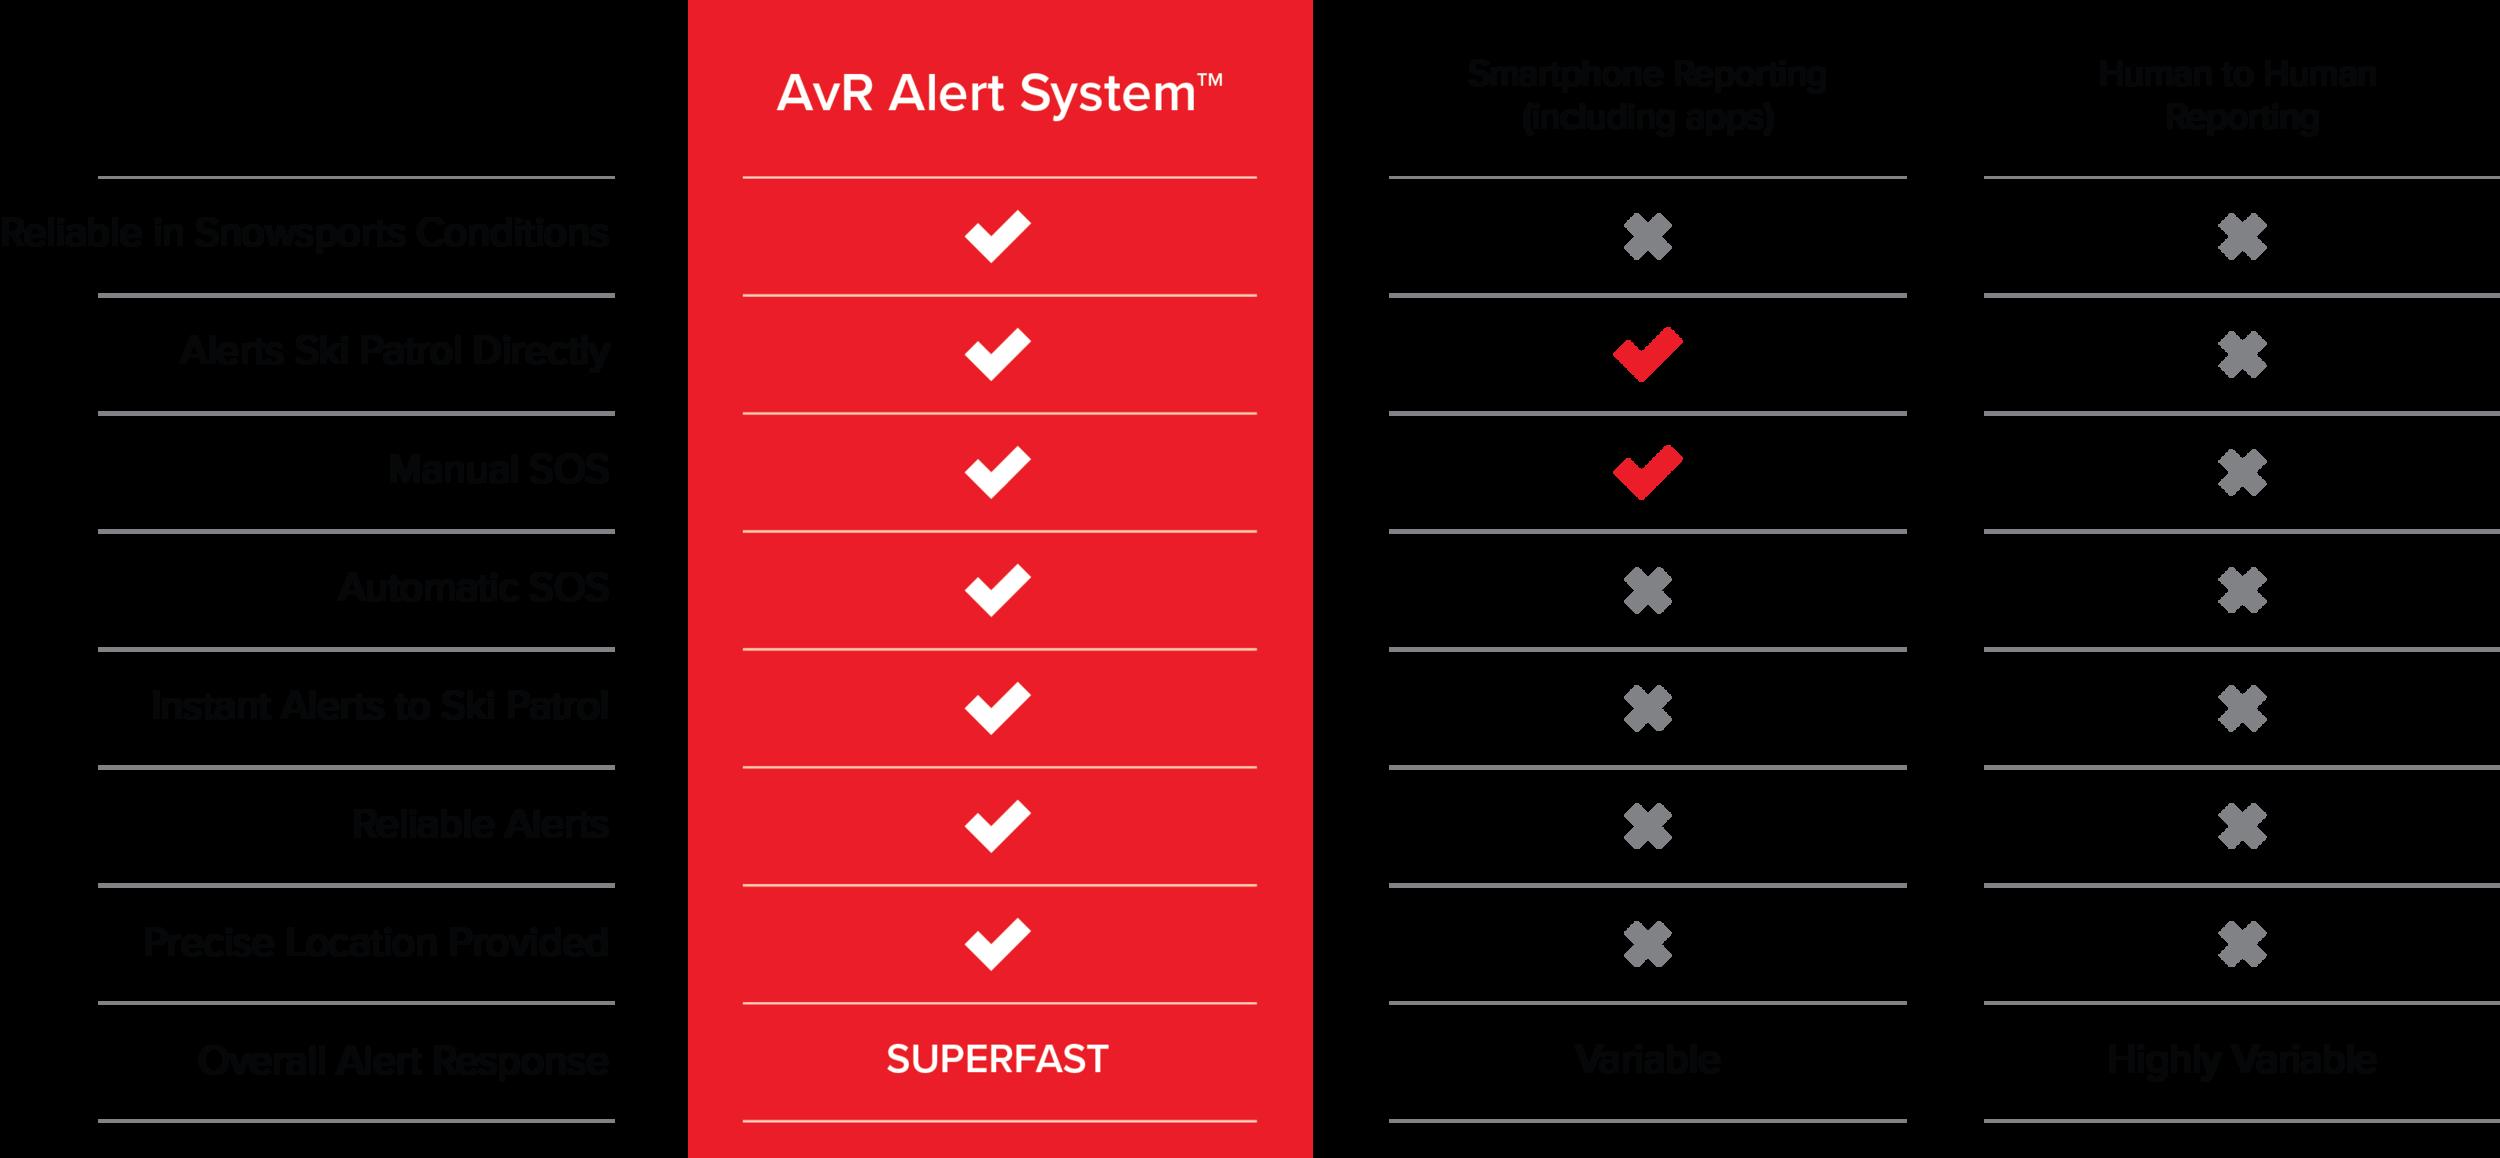 AvR_comparison_matrix.png